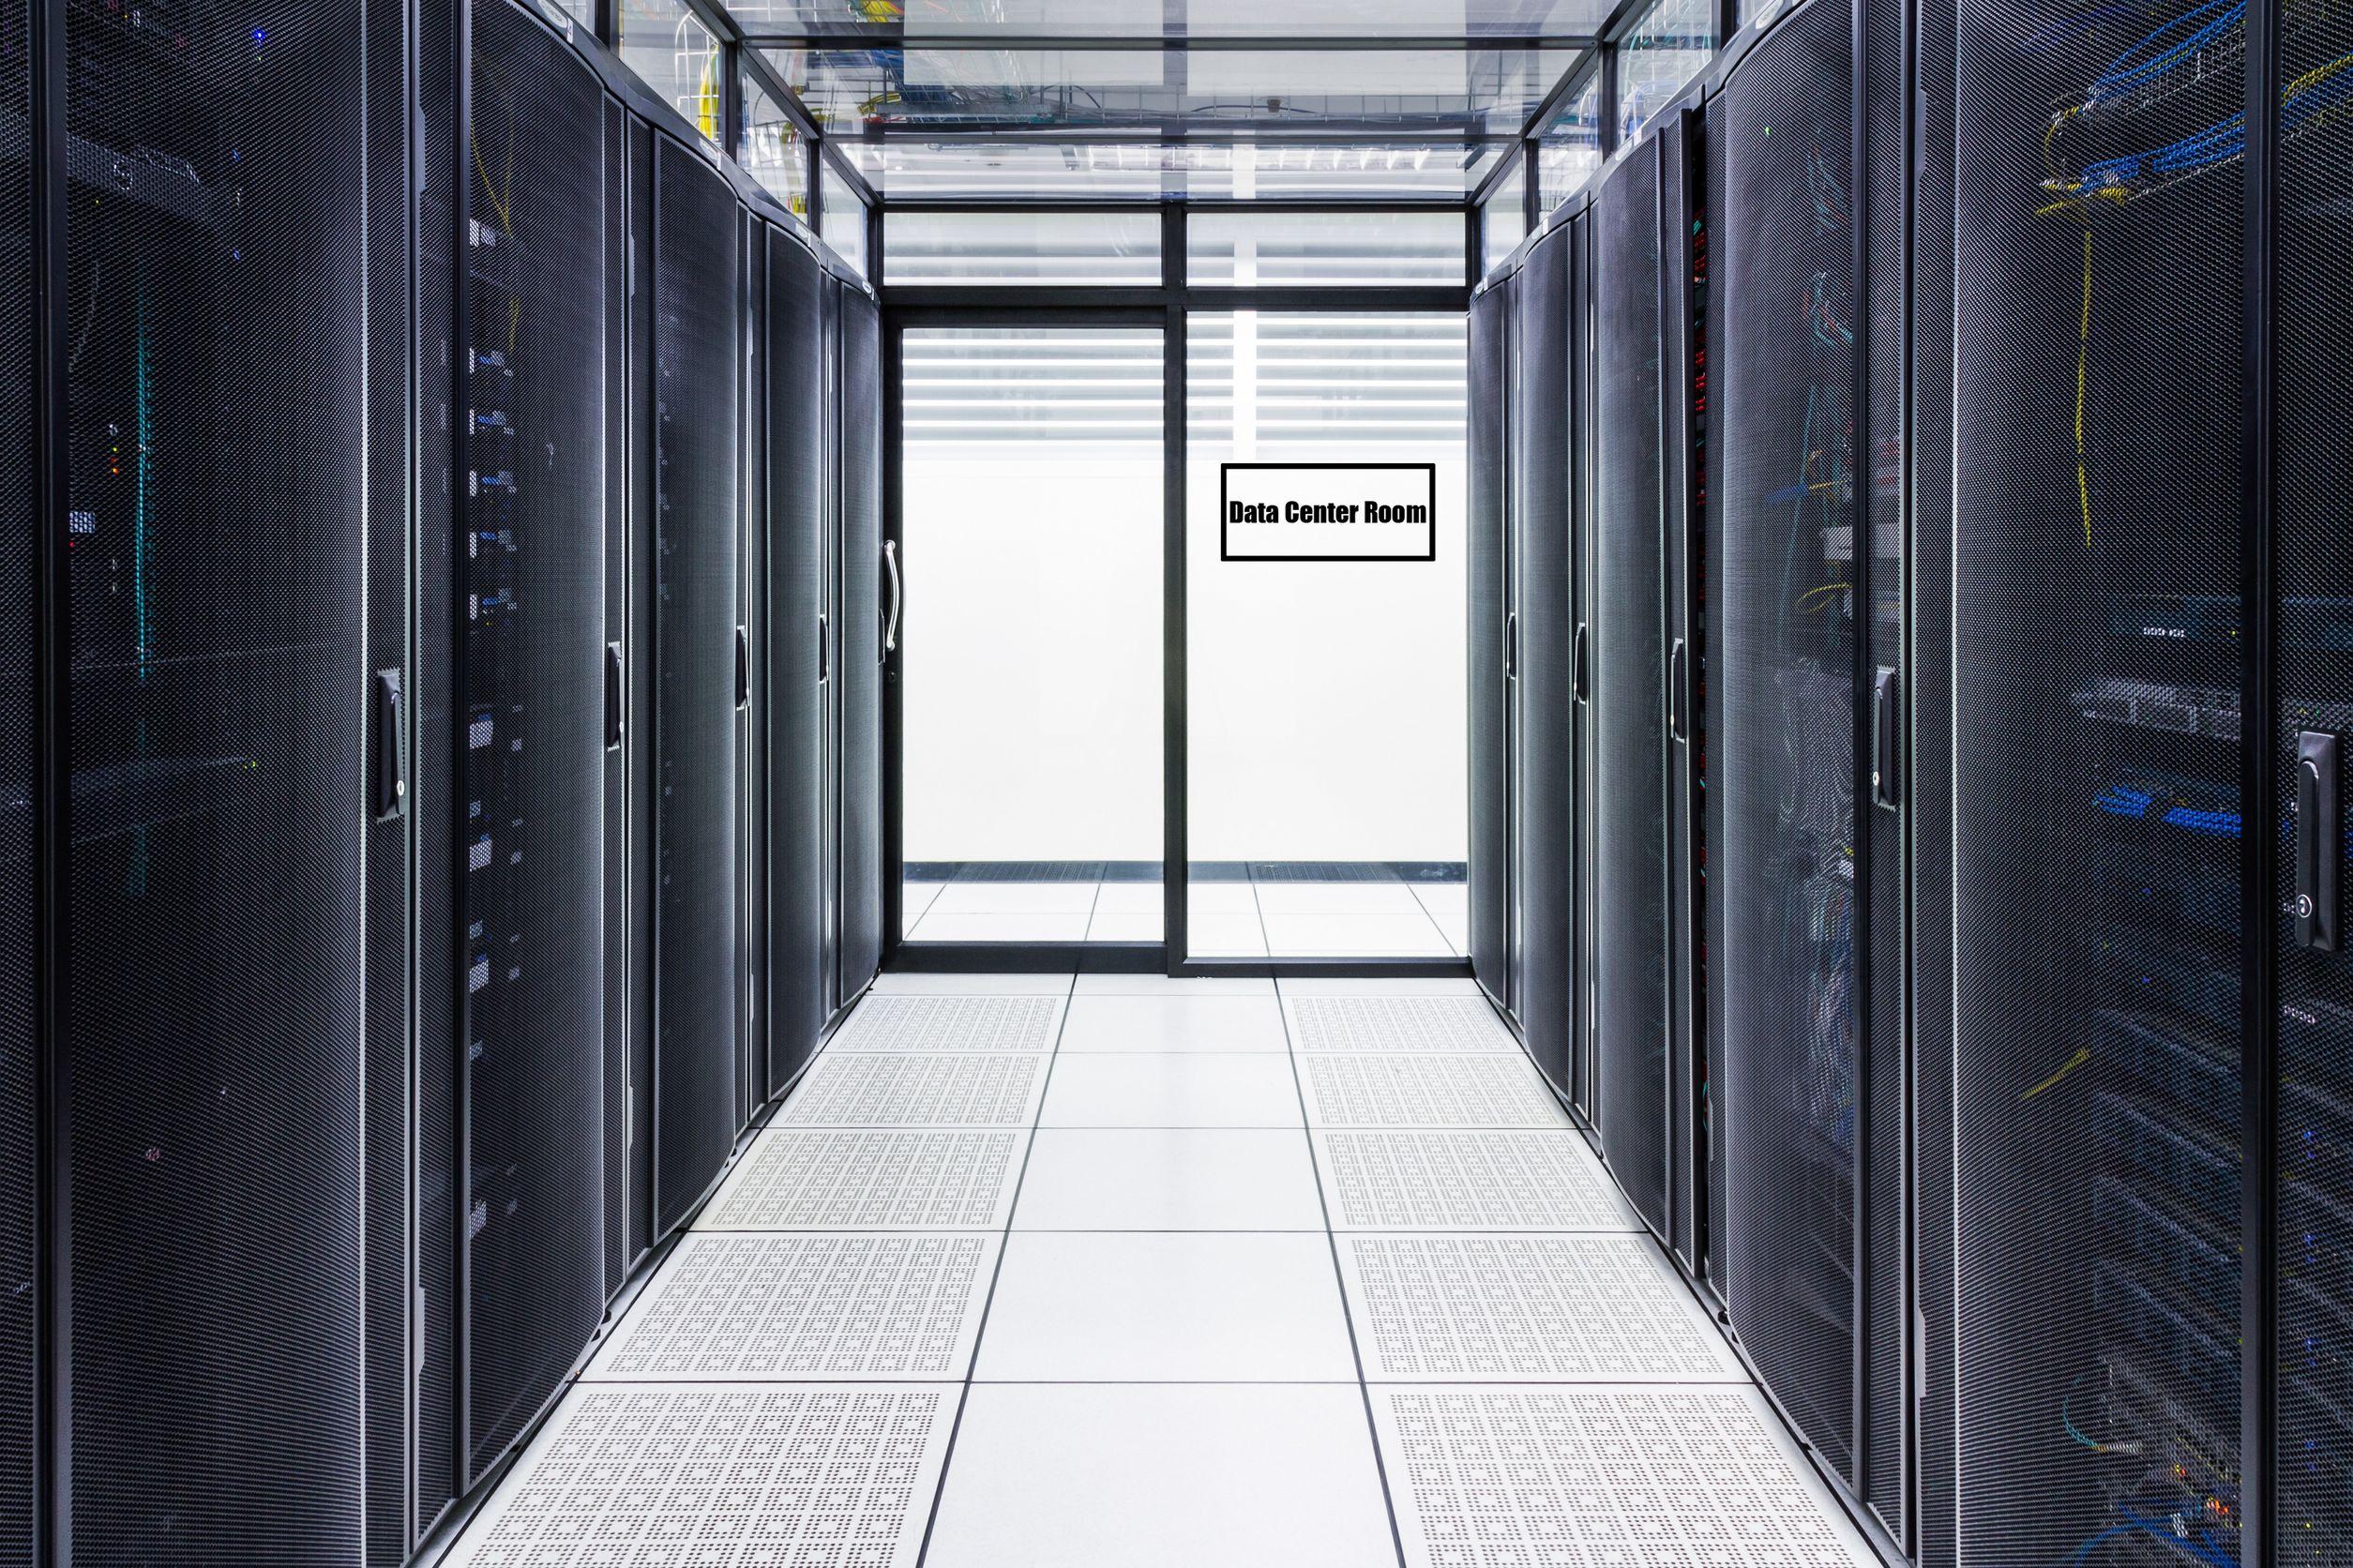 software-defined-data-center-room.jpg